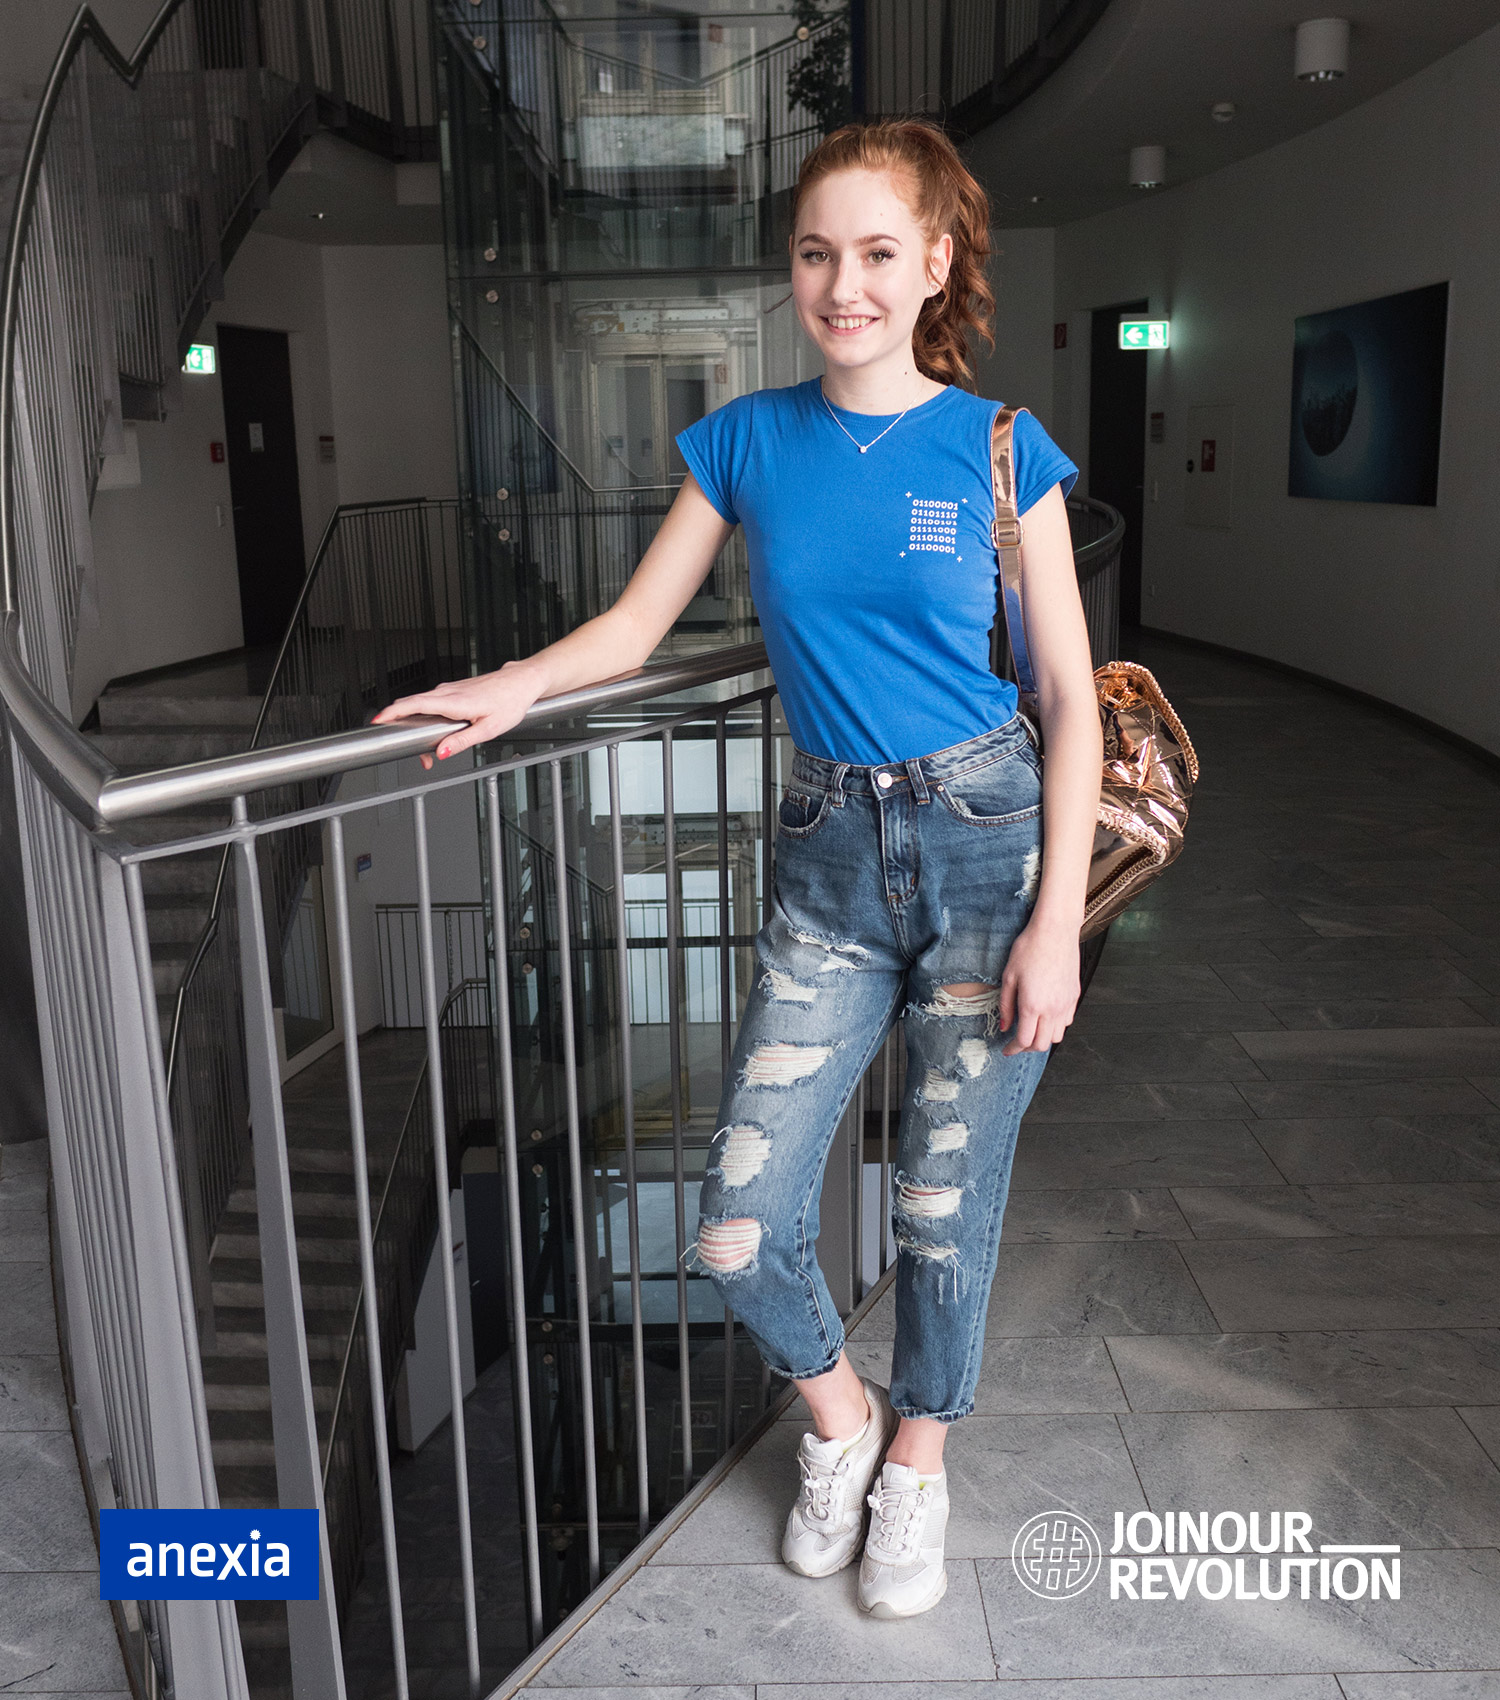 Anexia T-Shirt_4